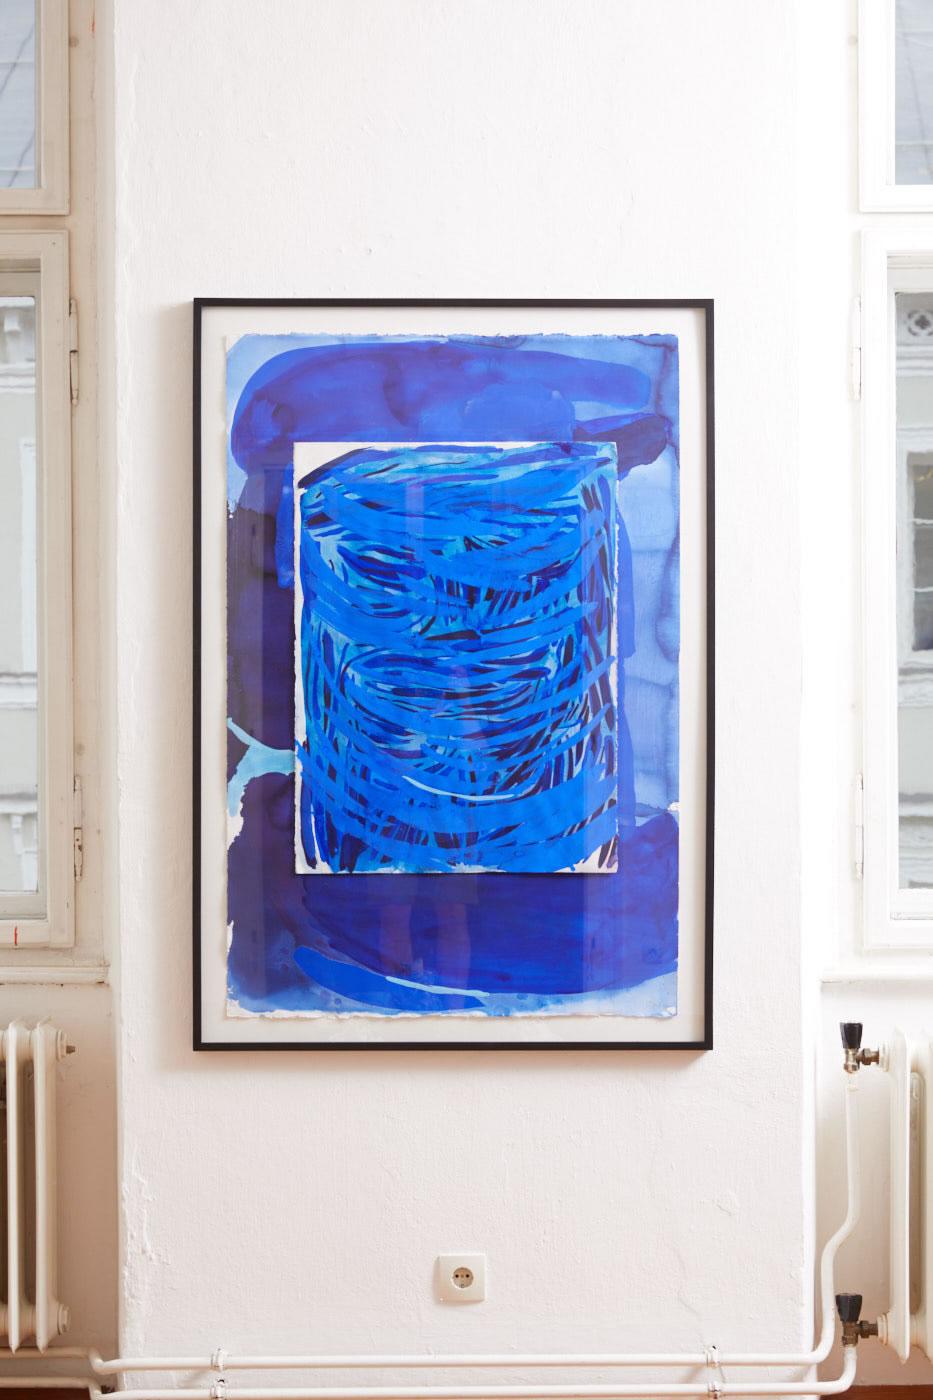 Veronika Dirnhofer | 2018 | 133 x 92 cm | Galerie3 | Foto Johannes Puch